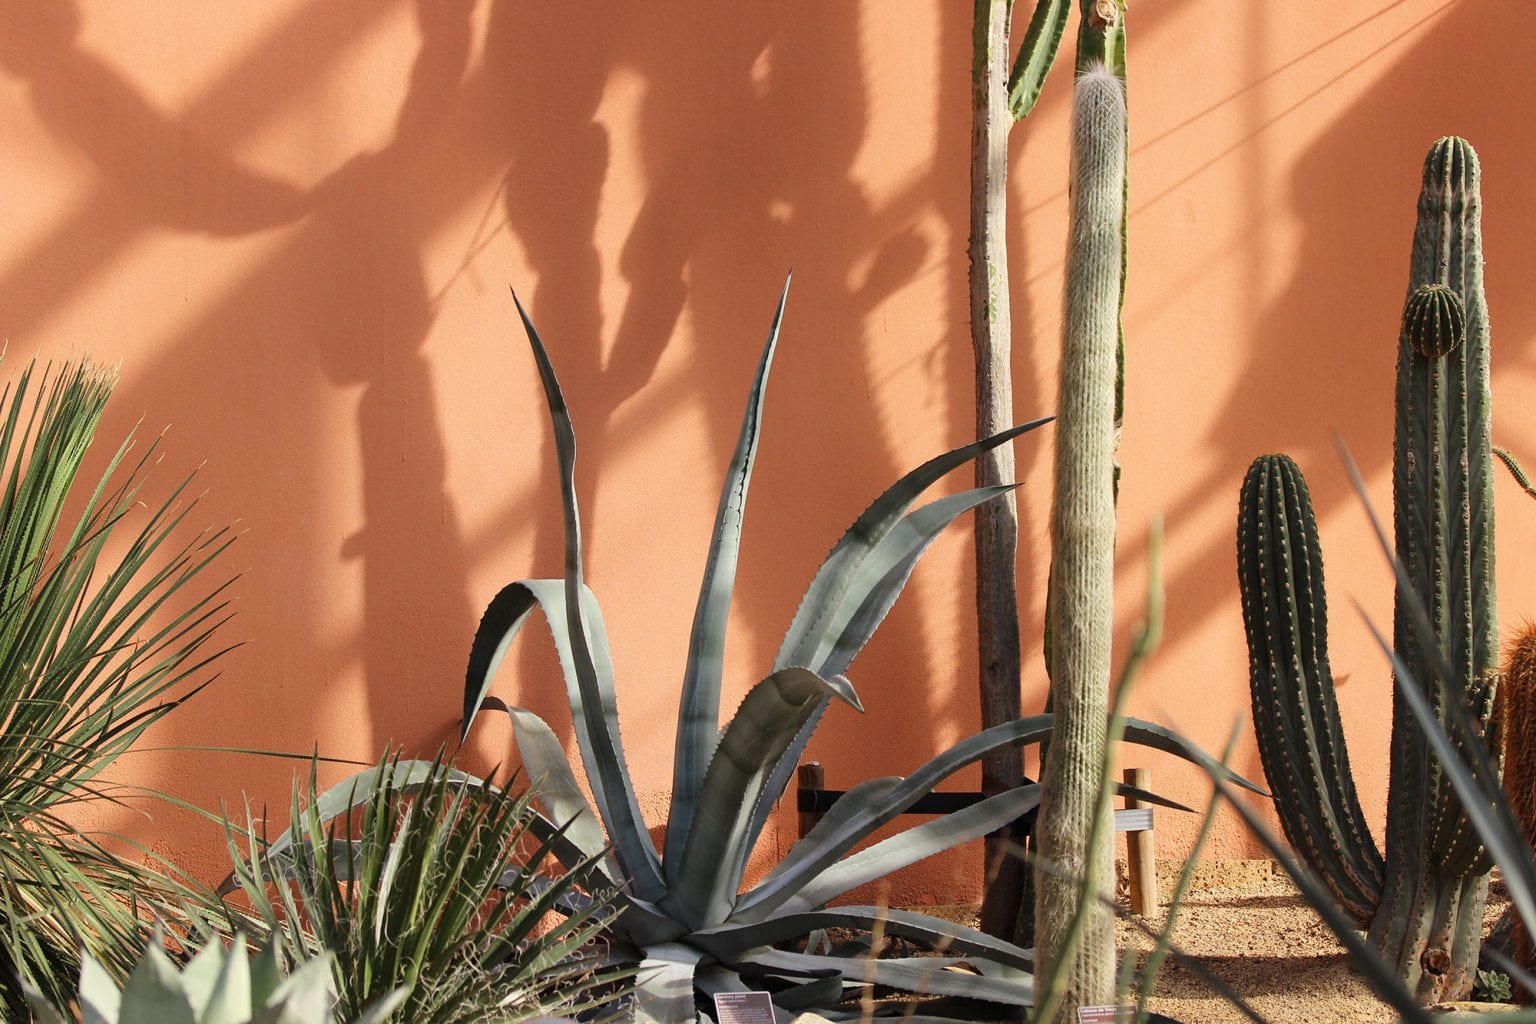 Hortus-plant-collection-4